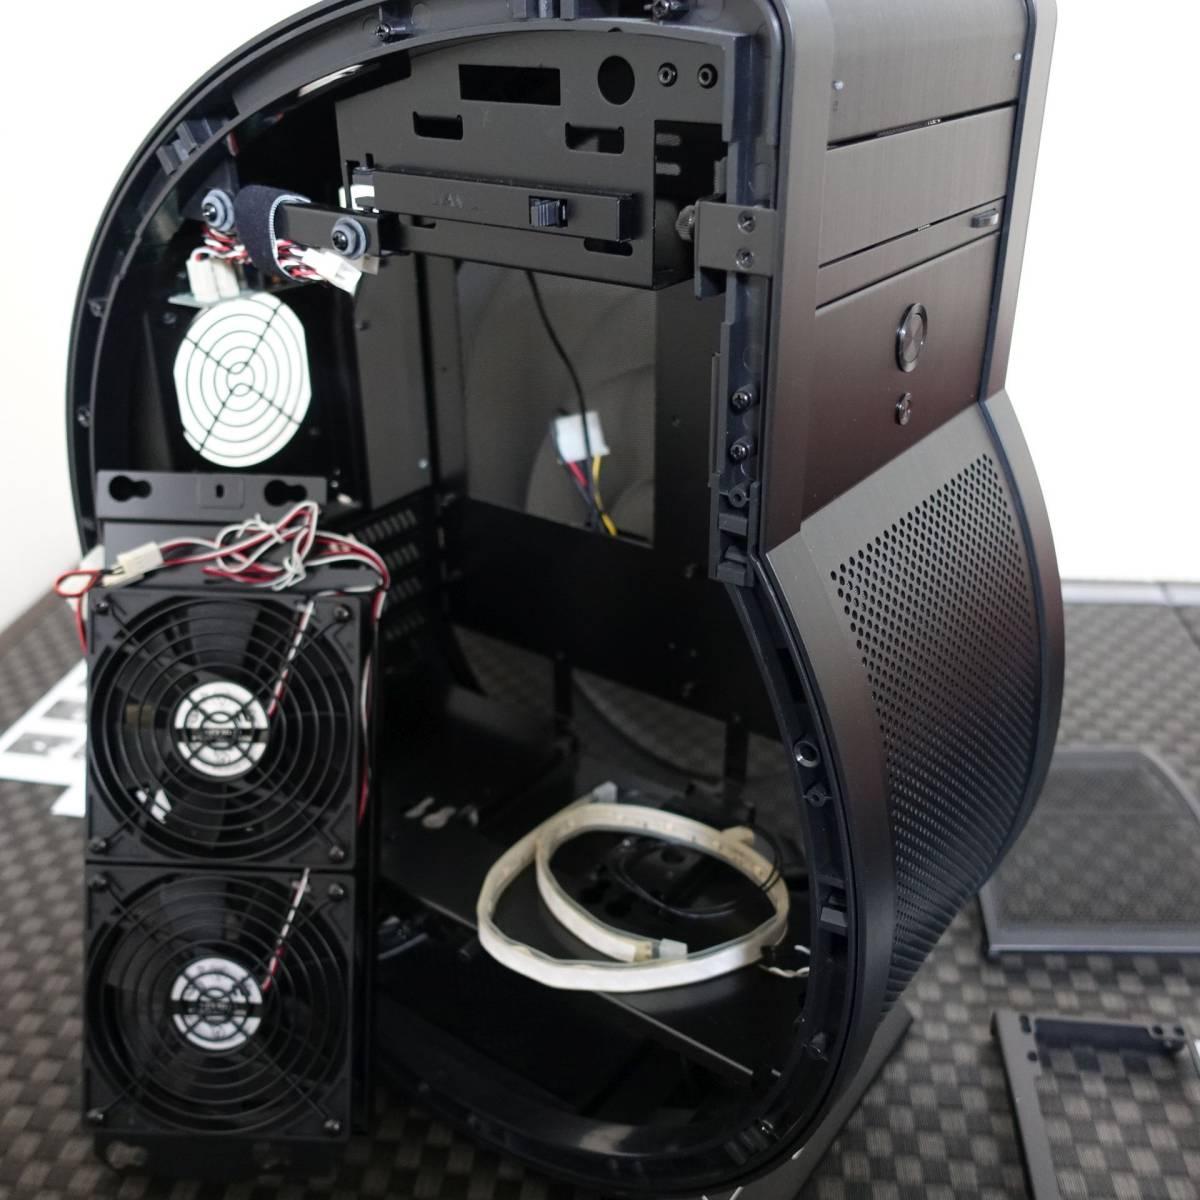 Lian Li カタツムリ型PCケース PC-U6 / アルミ Micro-ATX_画像3